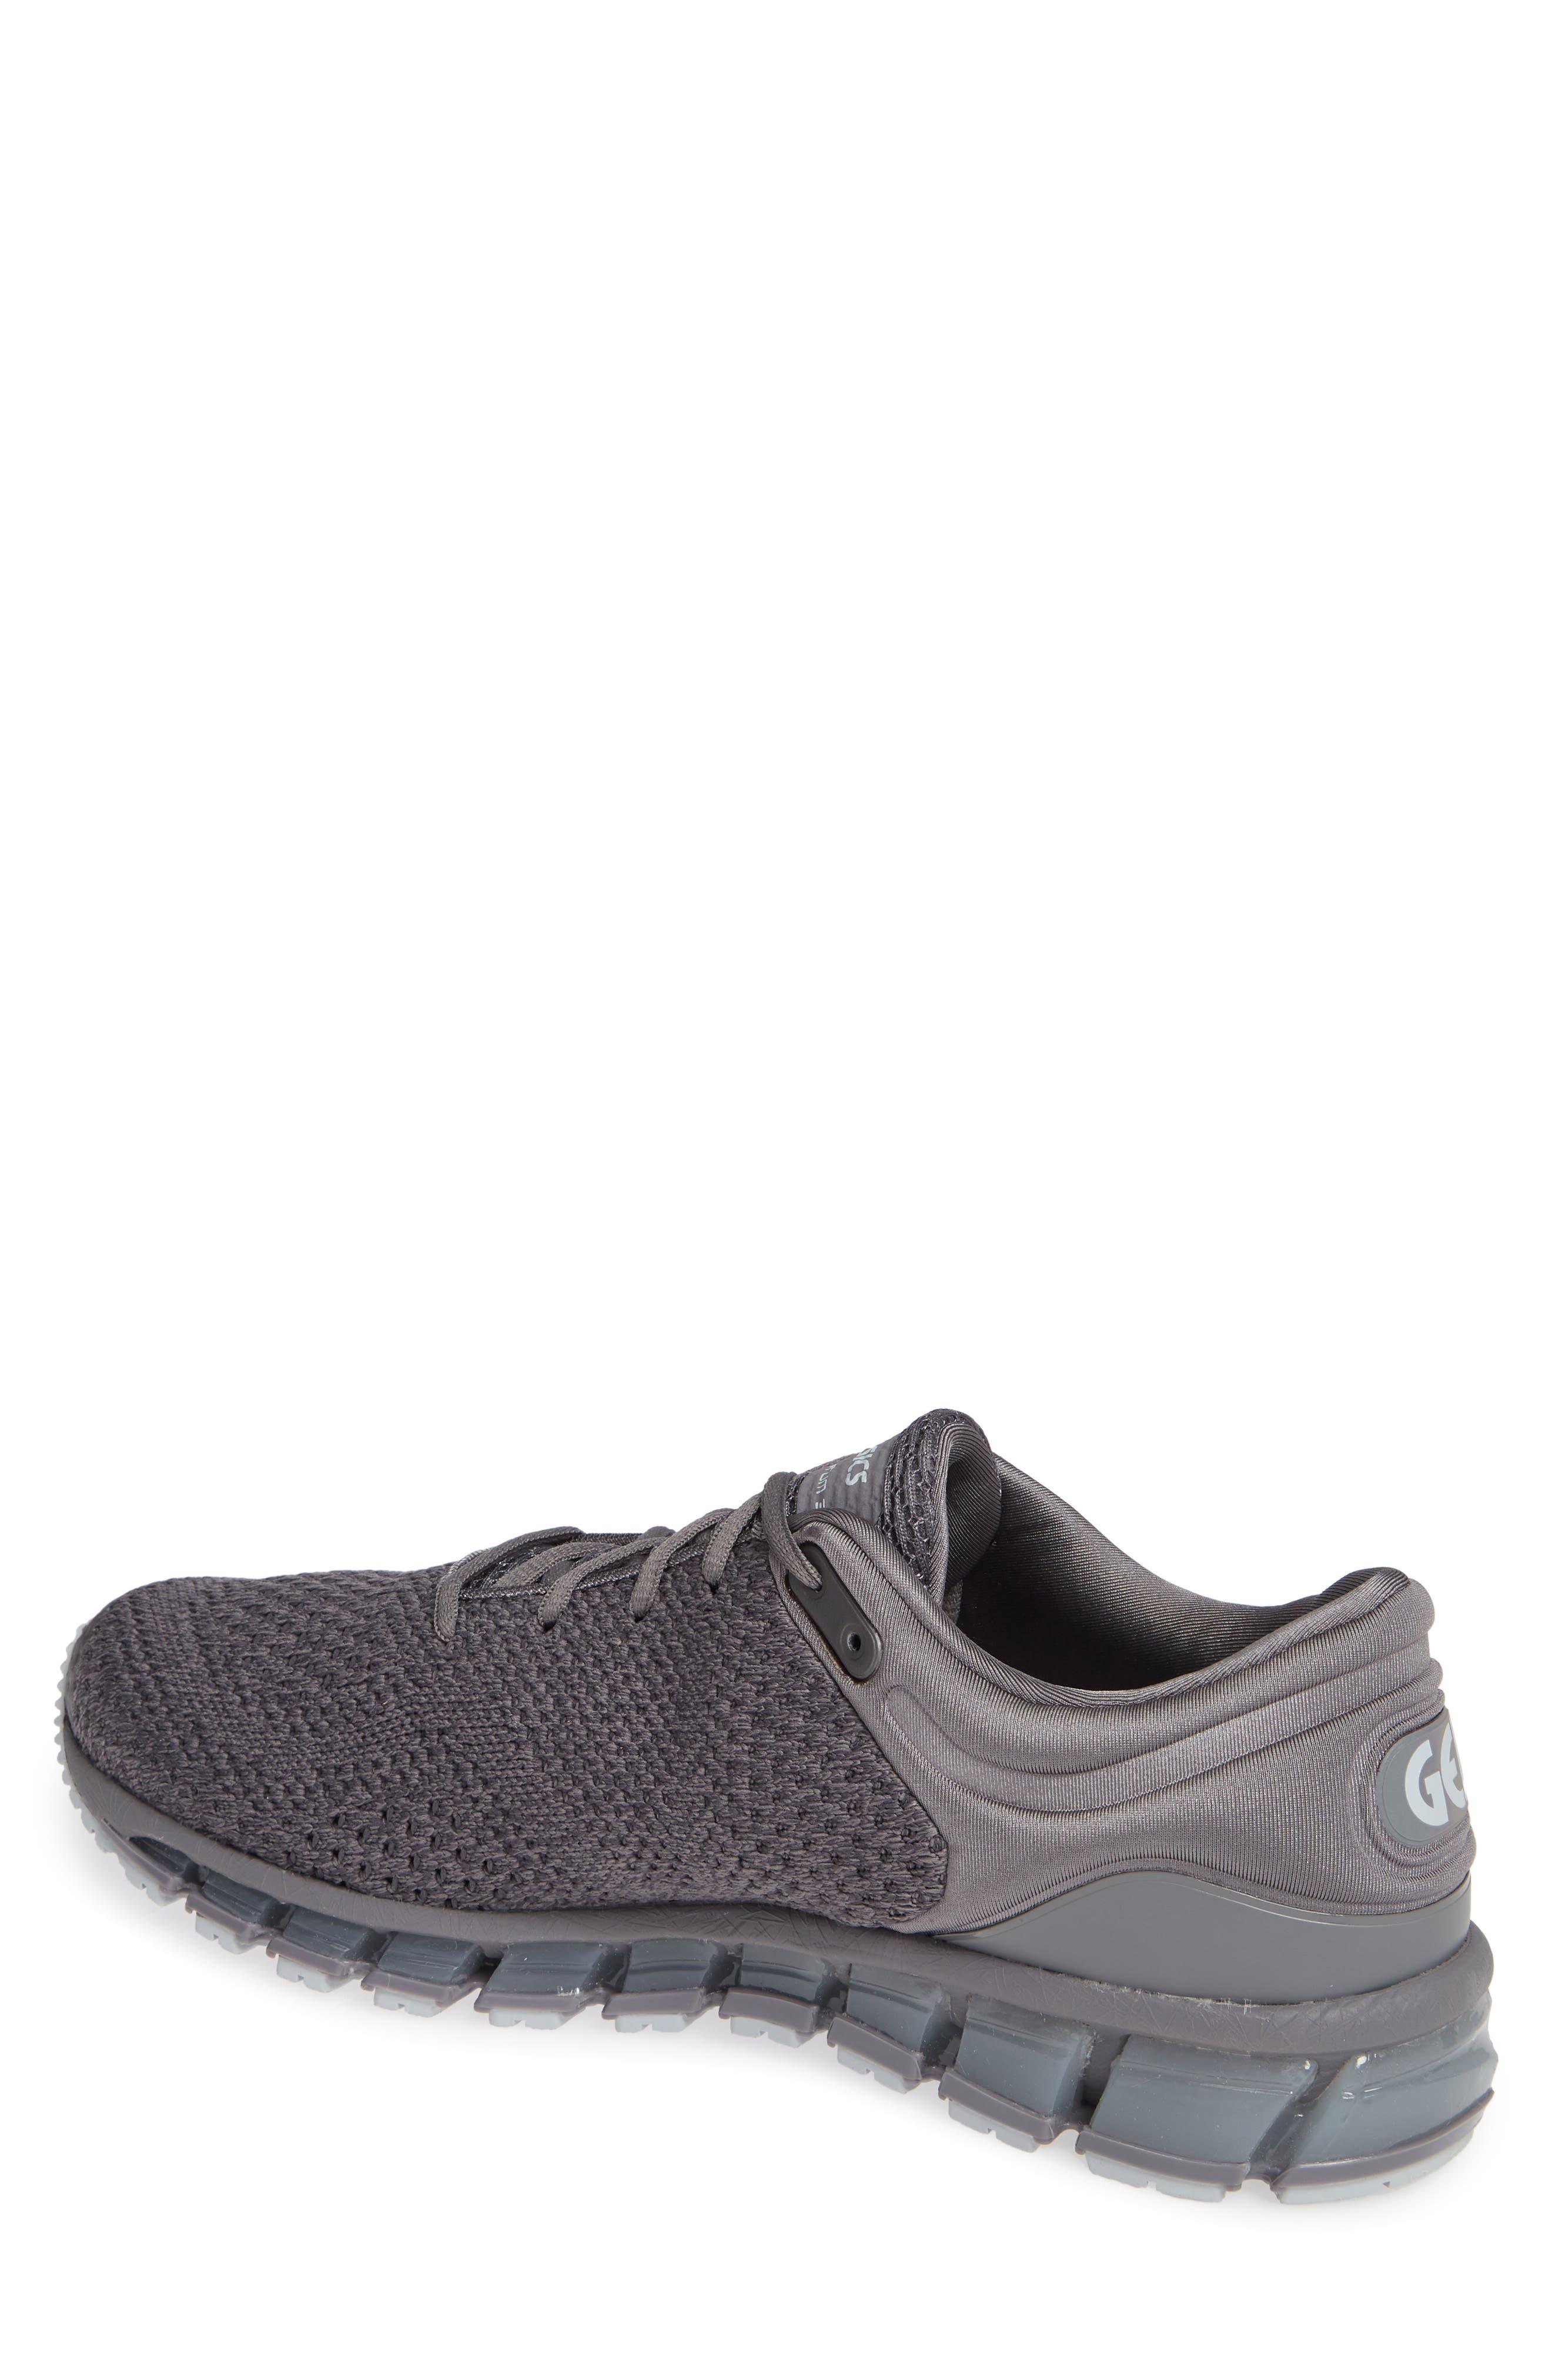 GEL-Quantum 360 Running Shoe,                             Alternate thumbnail 2, color,                             CARBON/ DARK GREY